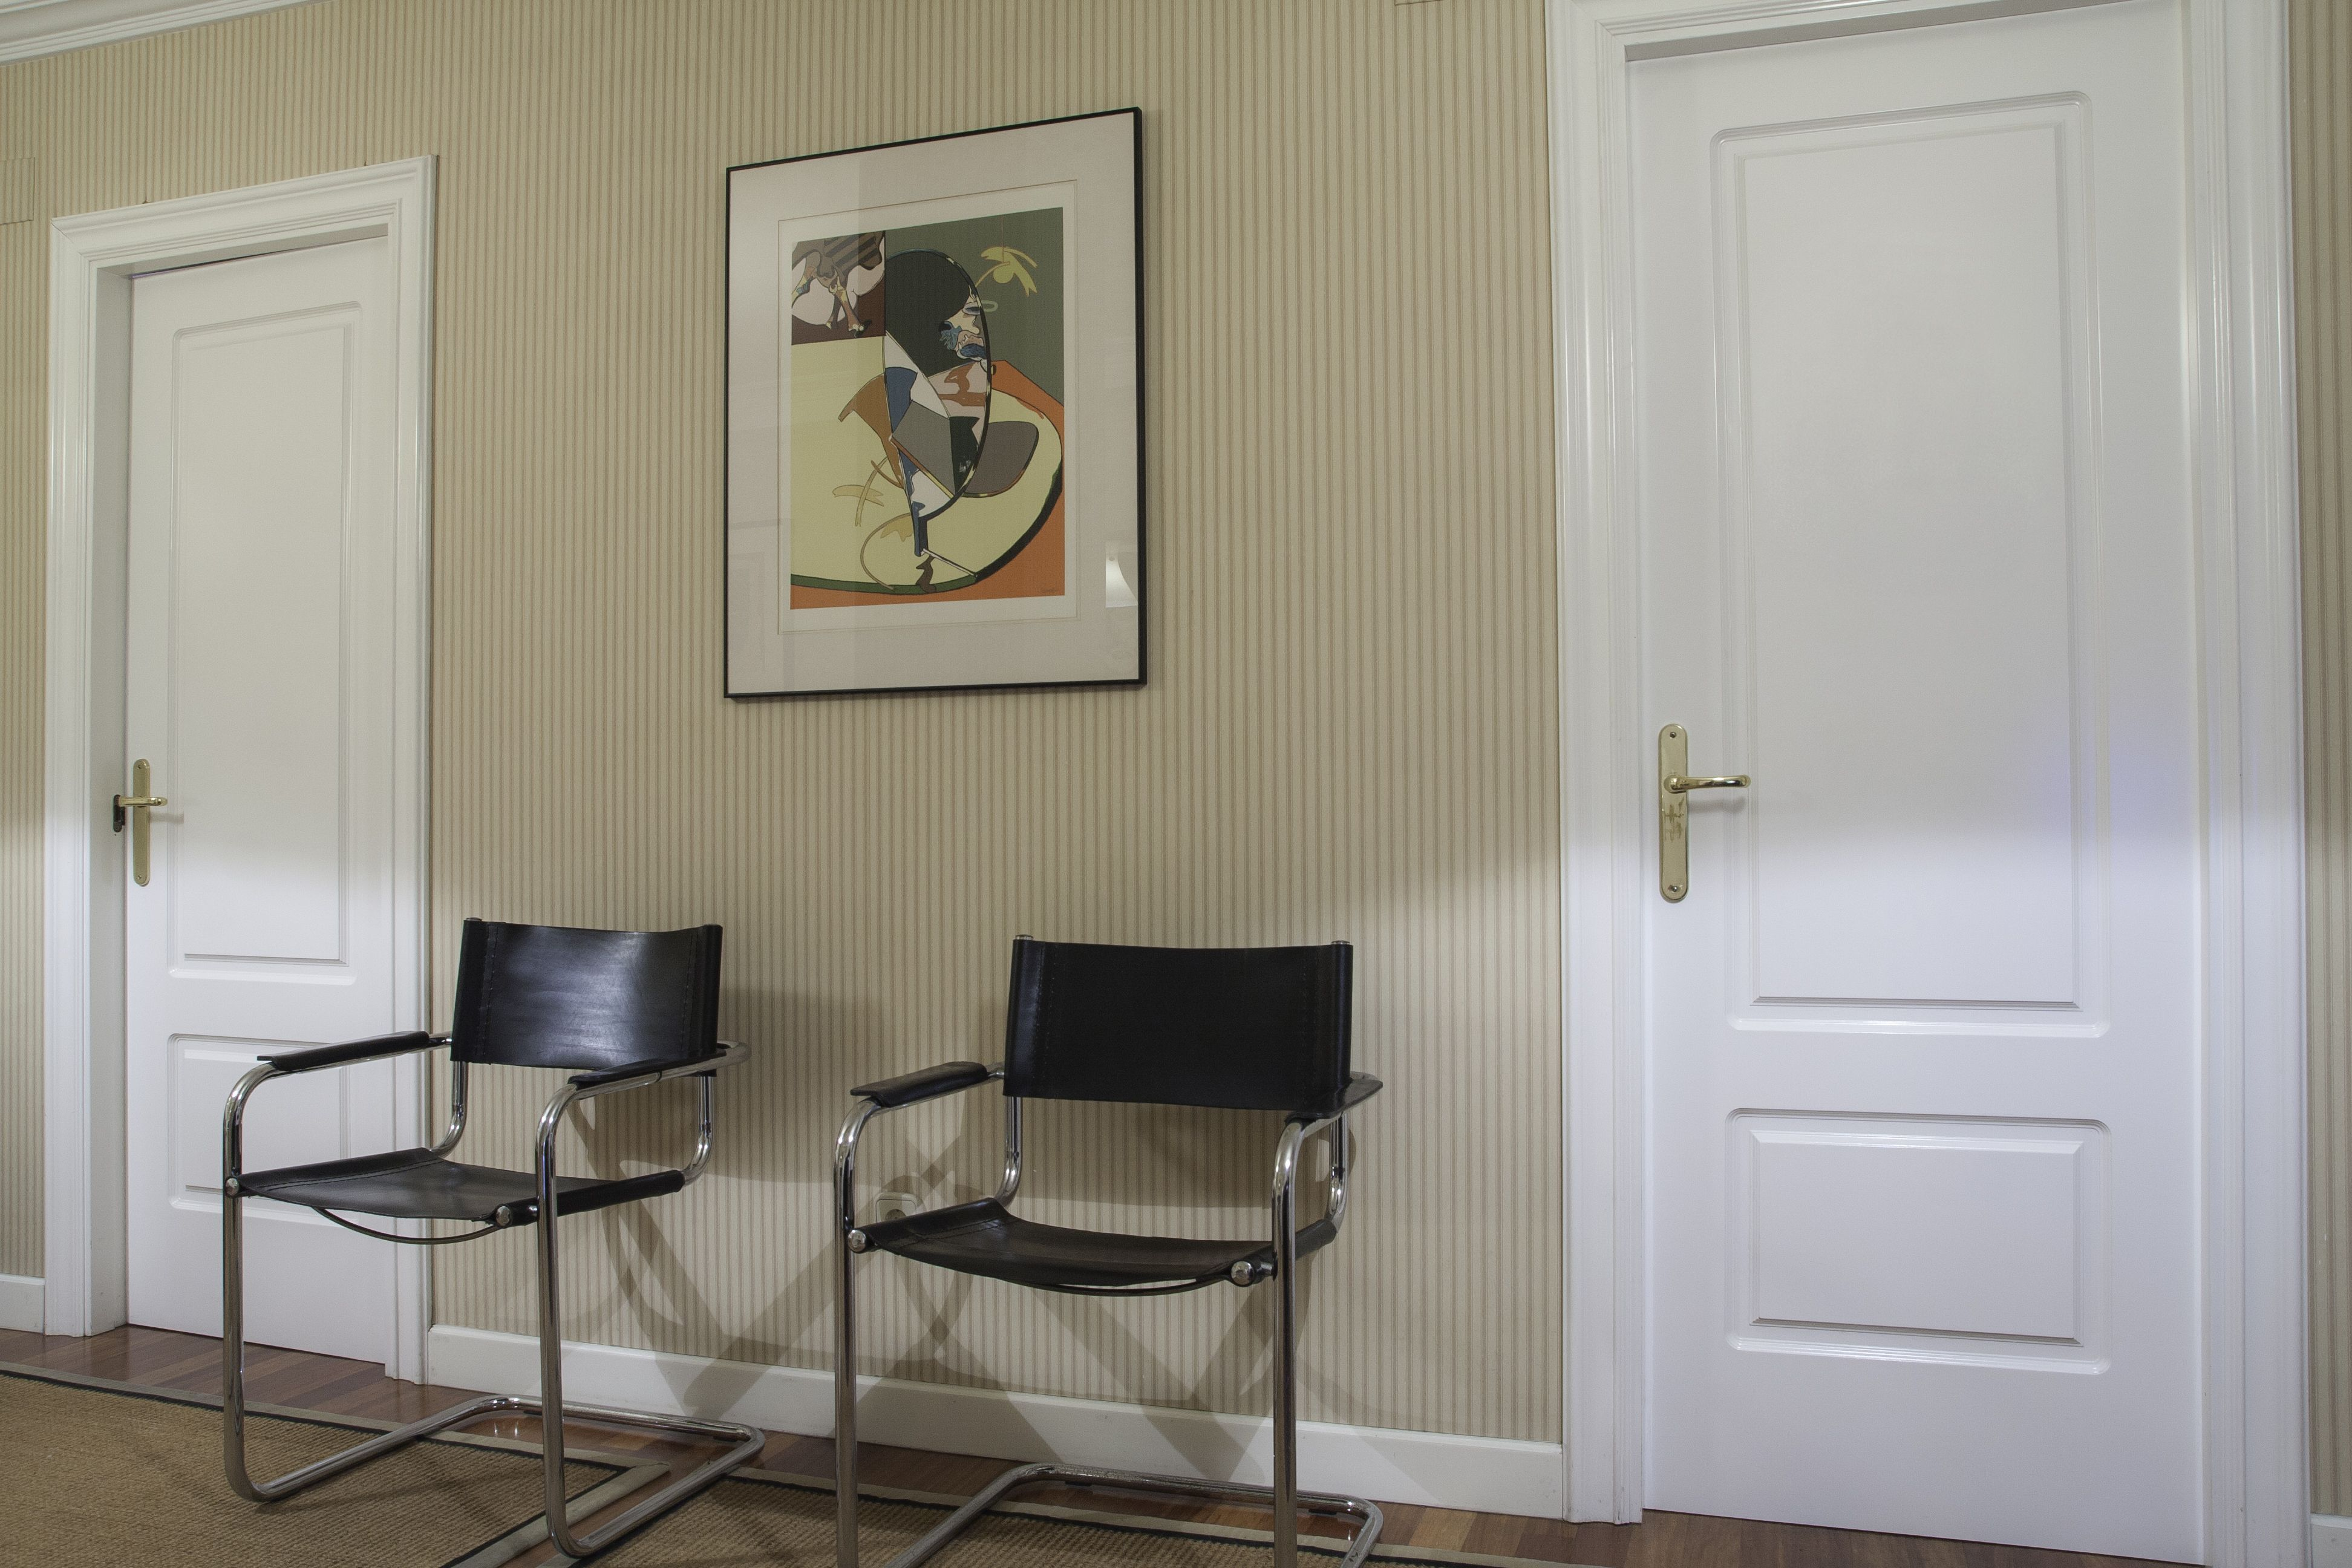 Mediadores familiares: Servicios de Montserrat González Rufo - Abogados